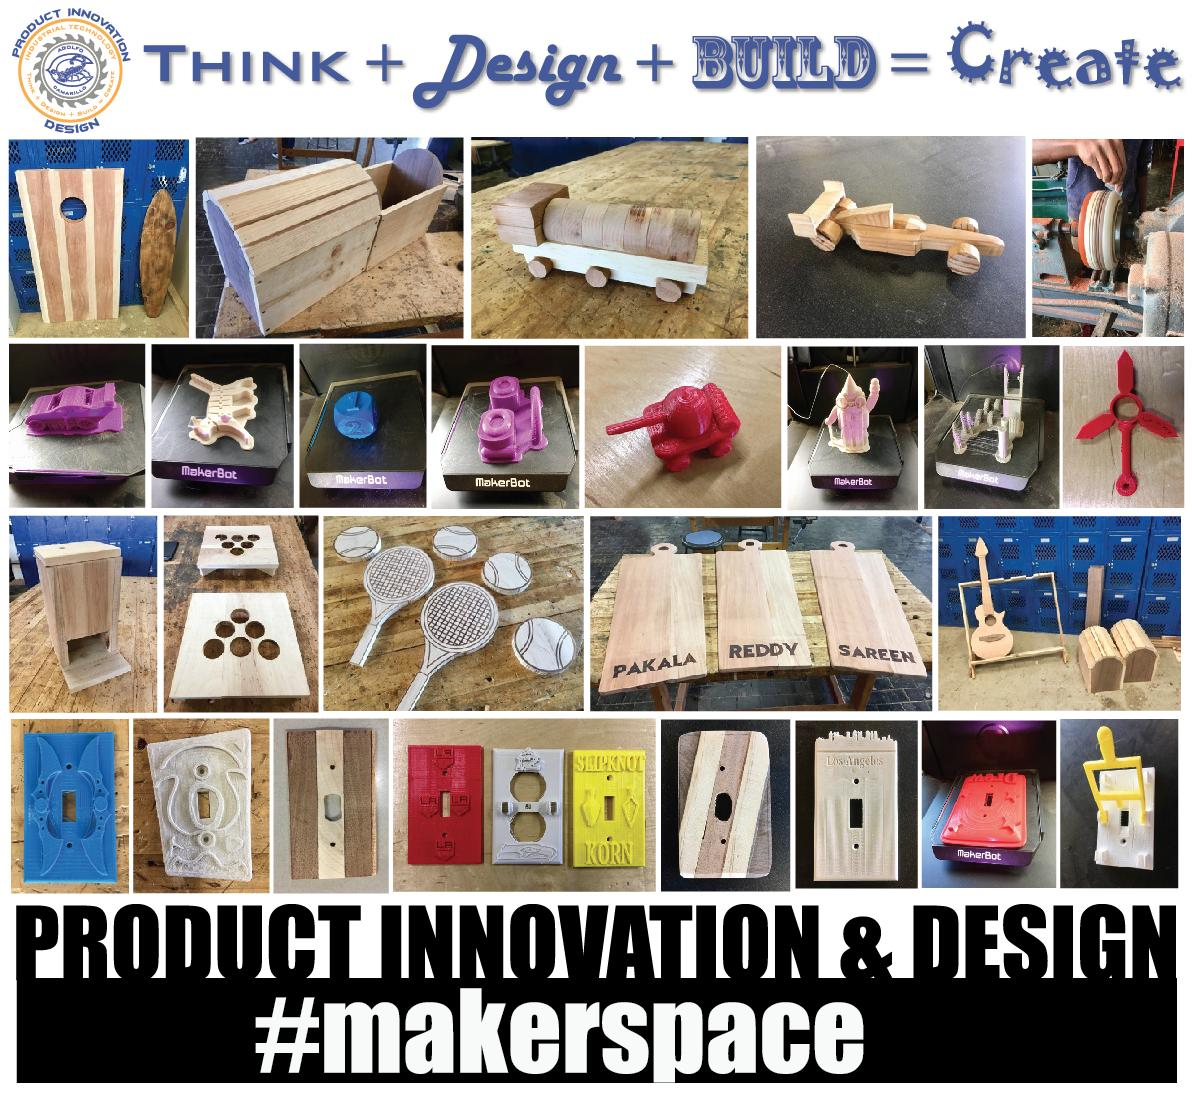 MakerBot (@makerbot) | Twitter